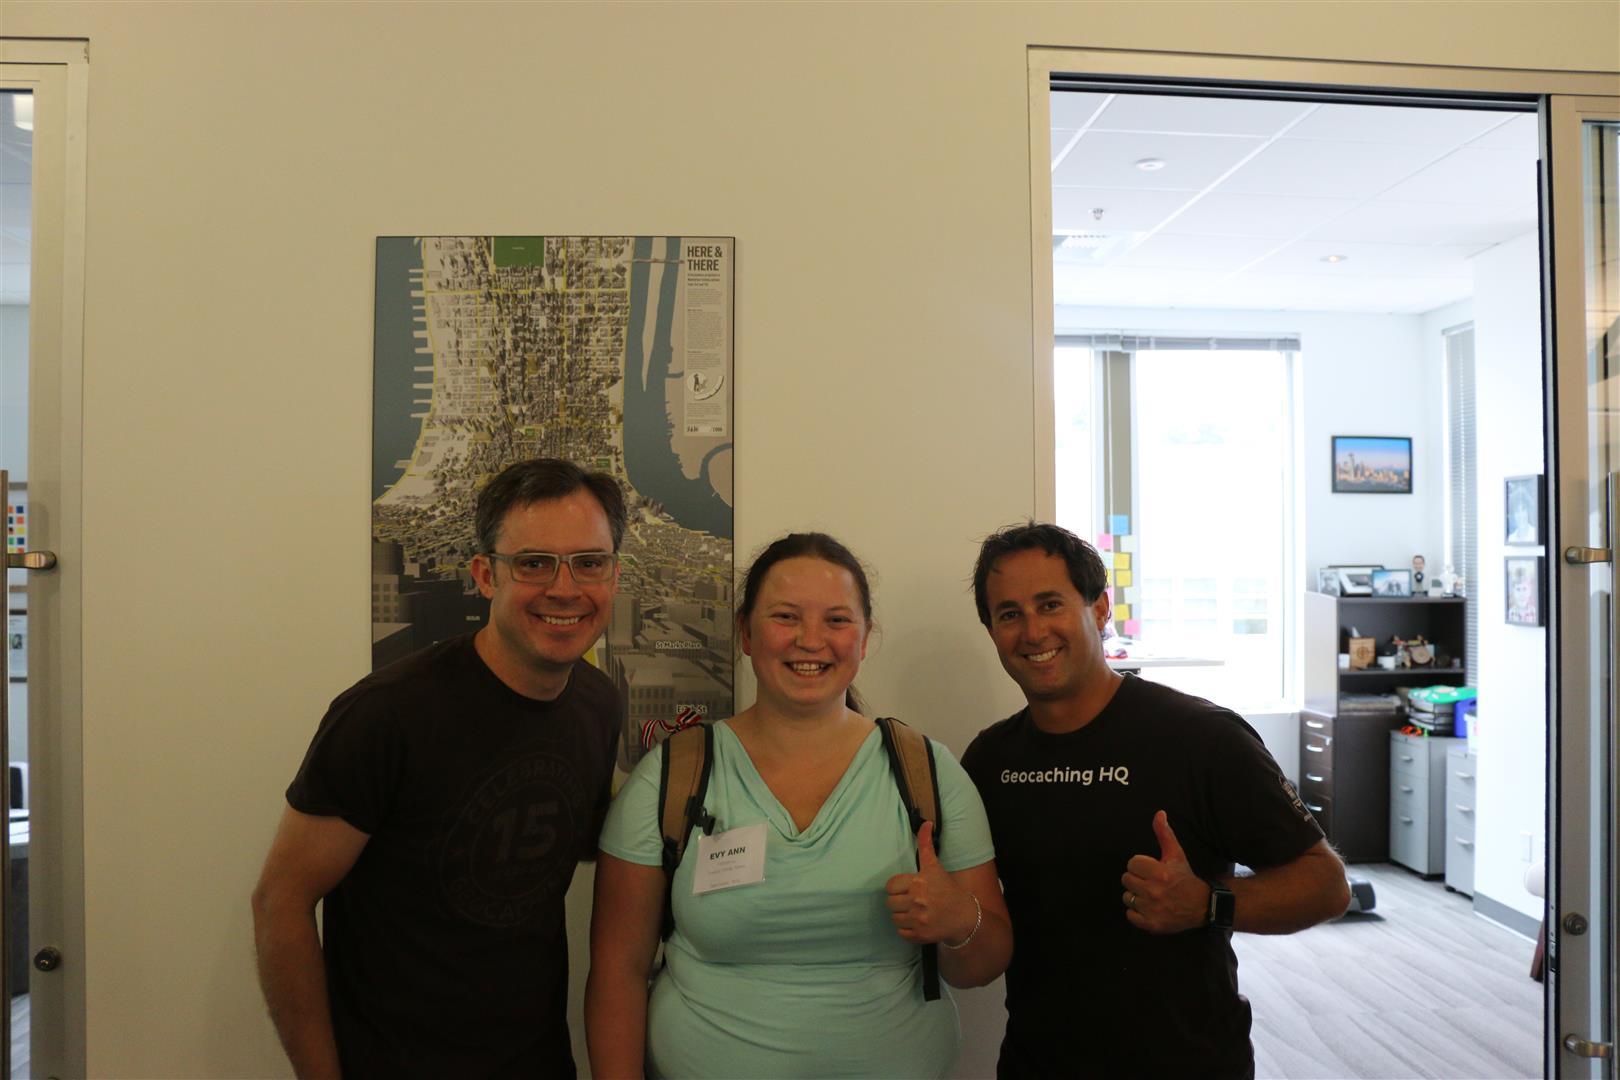 Jeremy, Heltinnen and Bryan